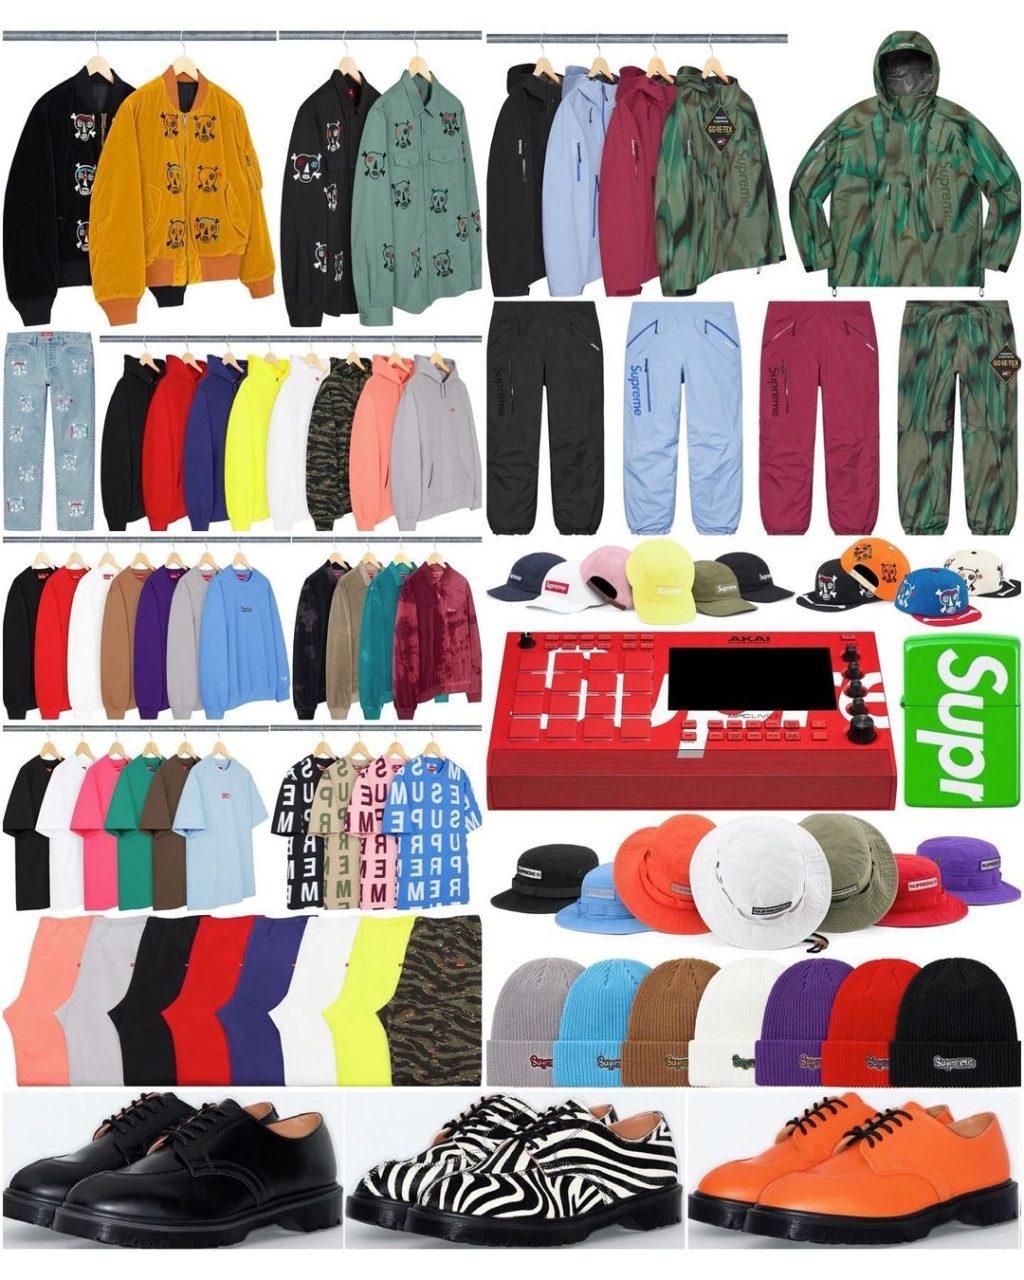 supreme-online-store-20210410-week7-release-items-list